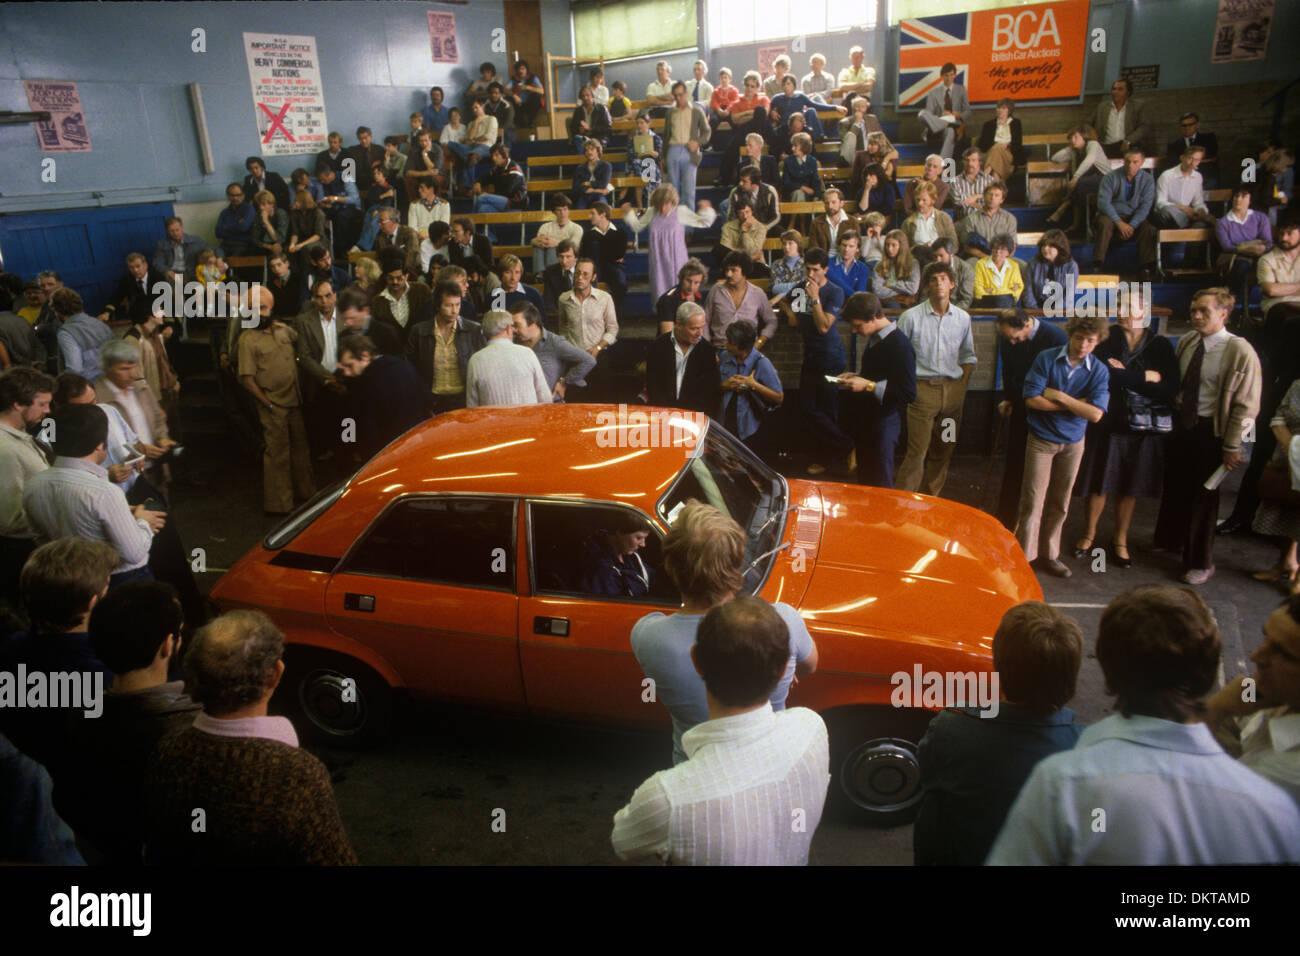 British Car Auctions Stock Photos & British Car Auctions ...